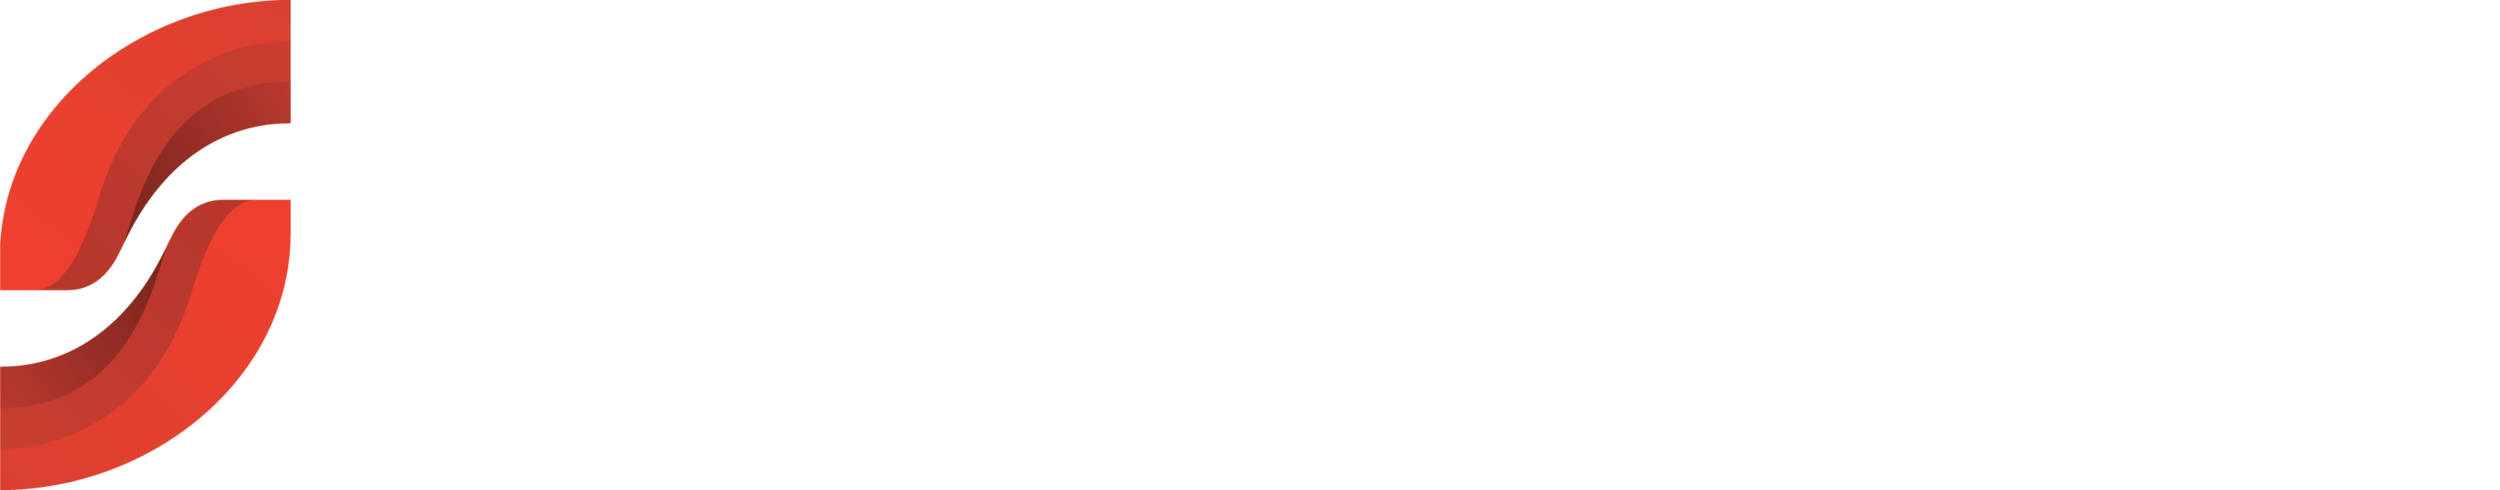 Satterley_Logo